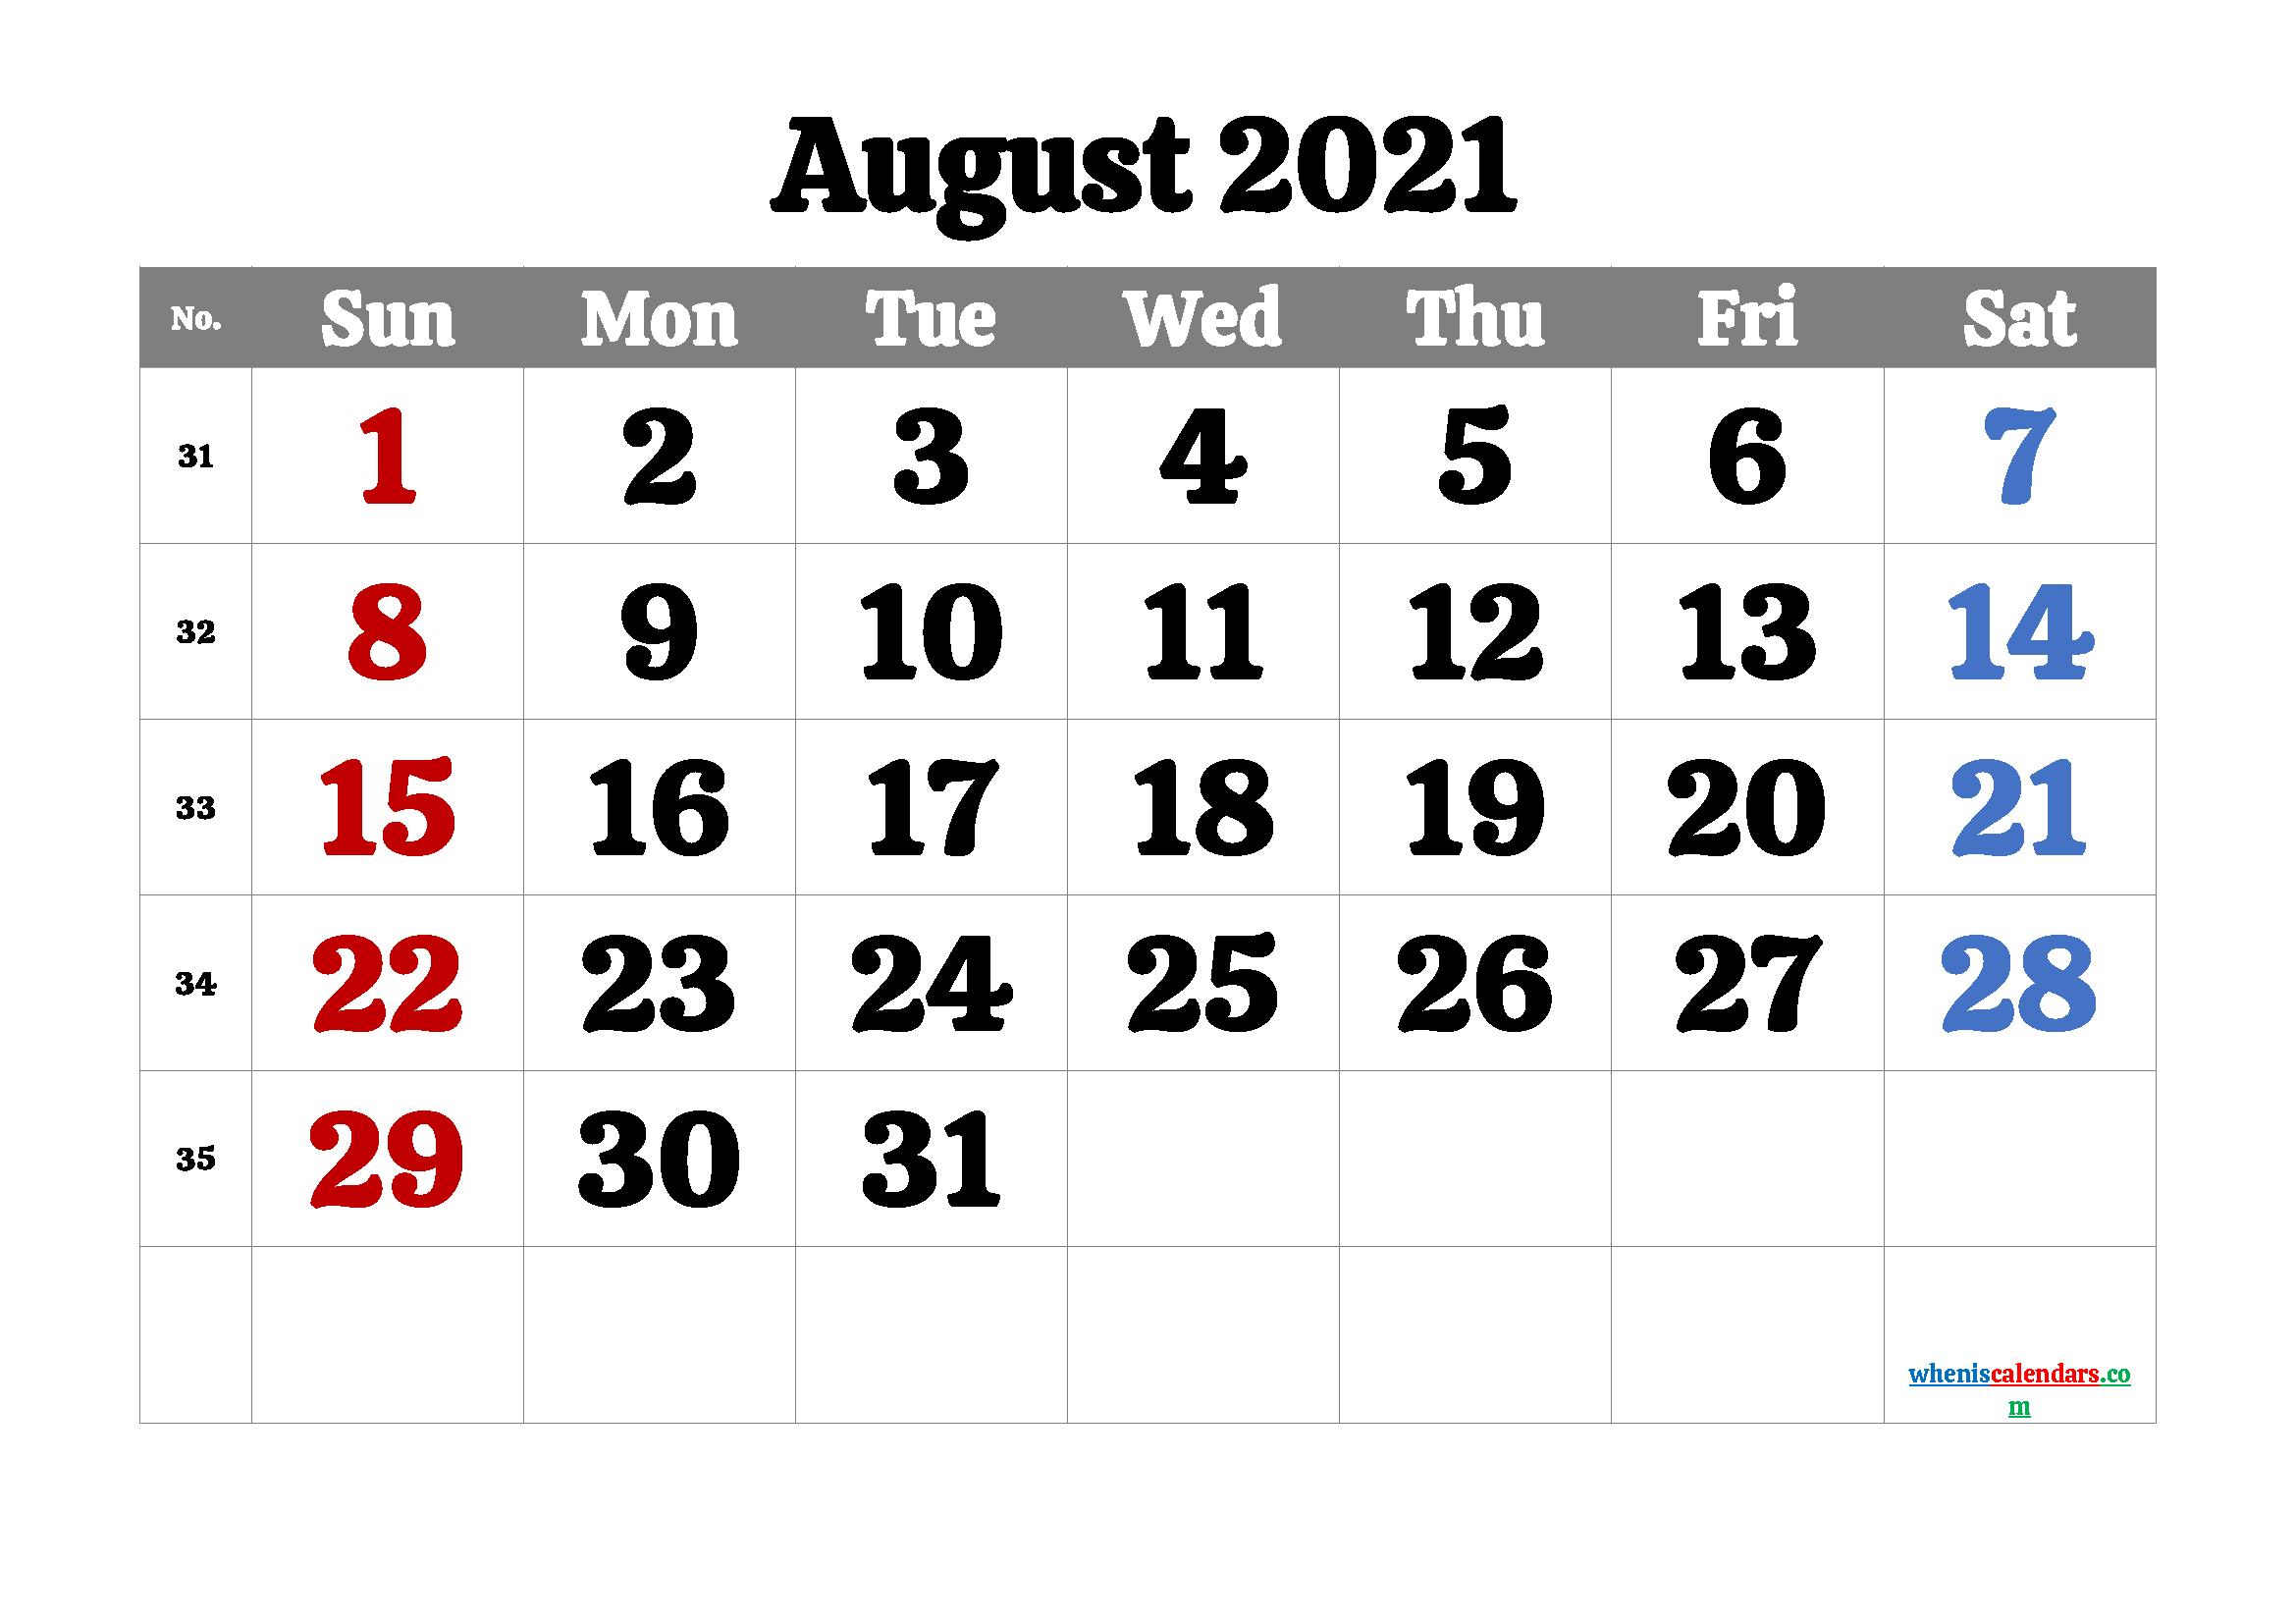 August 2021 Calendar Printable Free   Template M21Calistoga1 with regard to August 2021 Calendar Print